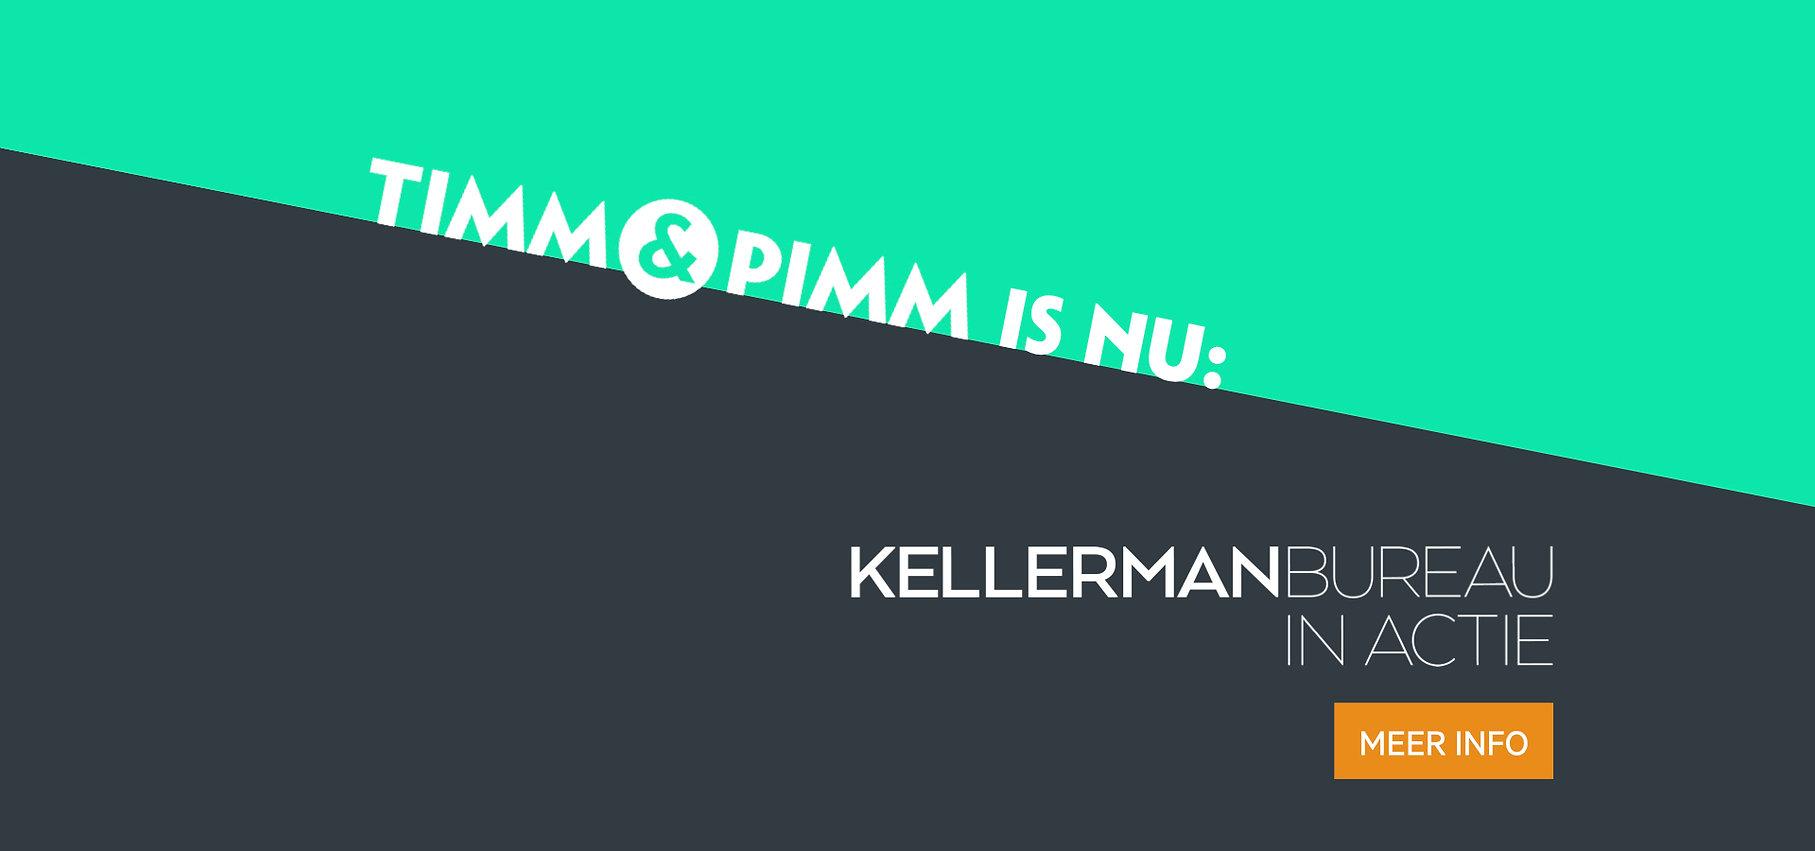 Timm & Pimm is Kellerman Bureau in Actie